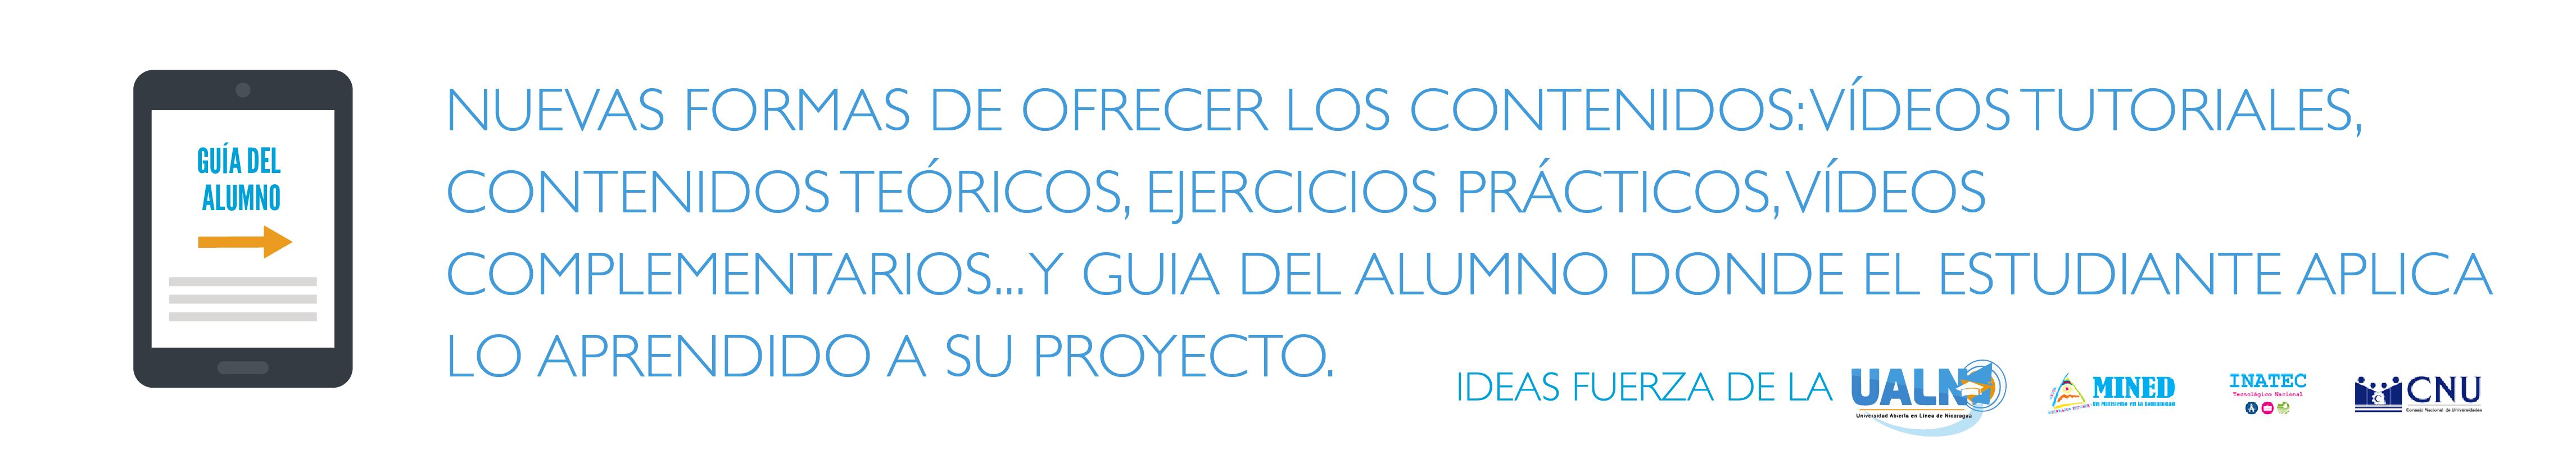 idea18-01